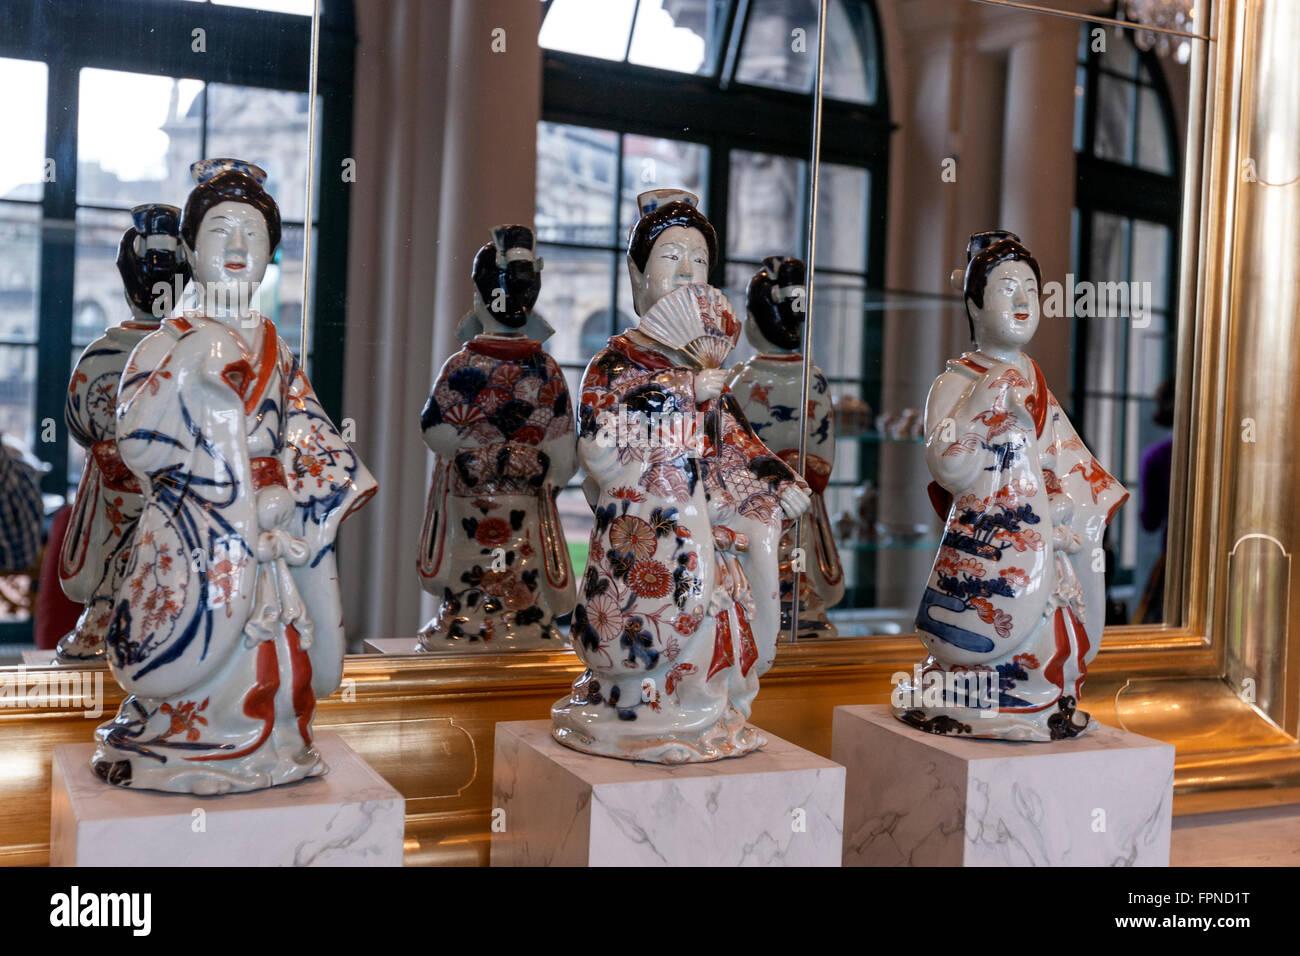 Japanese Ladies On Imari Porcelain Dresden Porcelain Collection Stock Photo Alamy